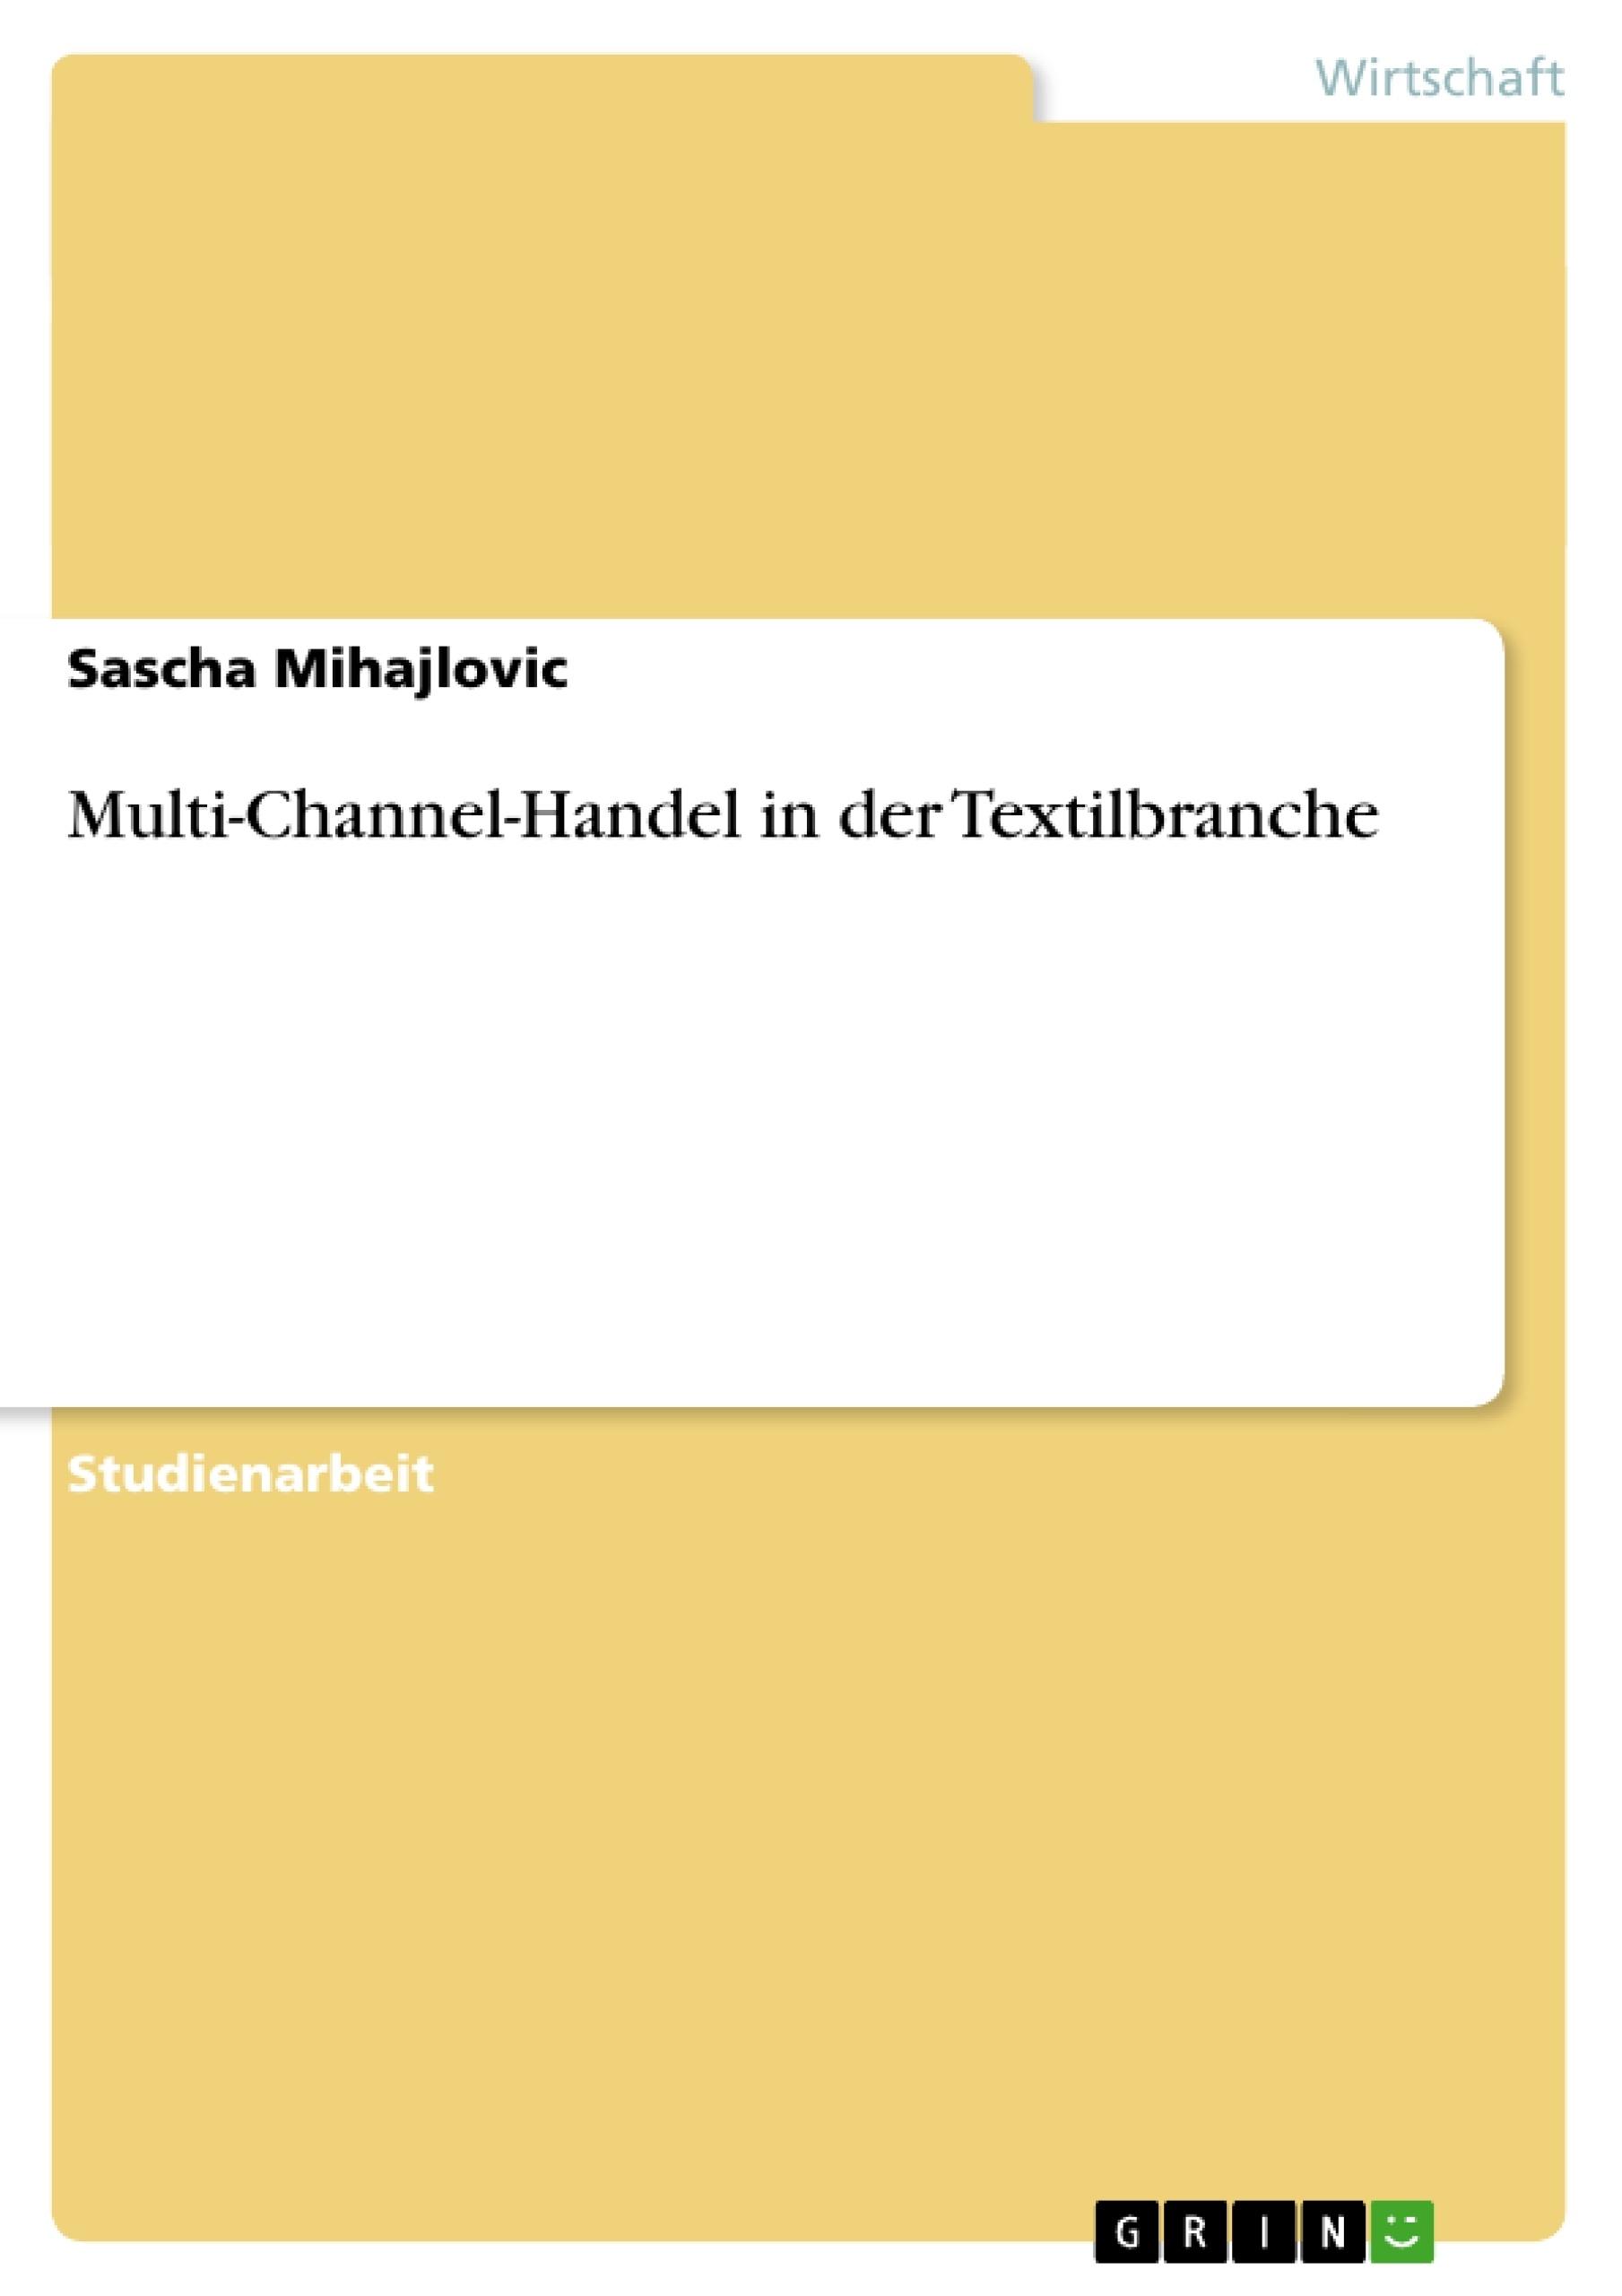 Titel: Multi-Channel-Handel in der Textilbranche